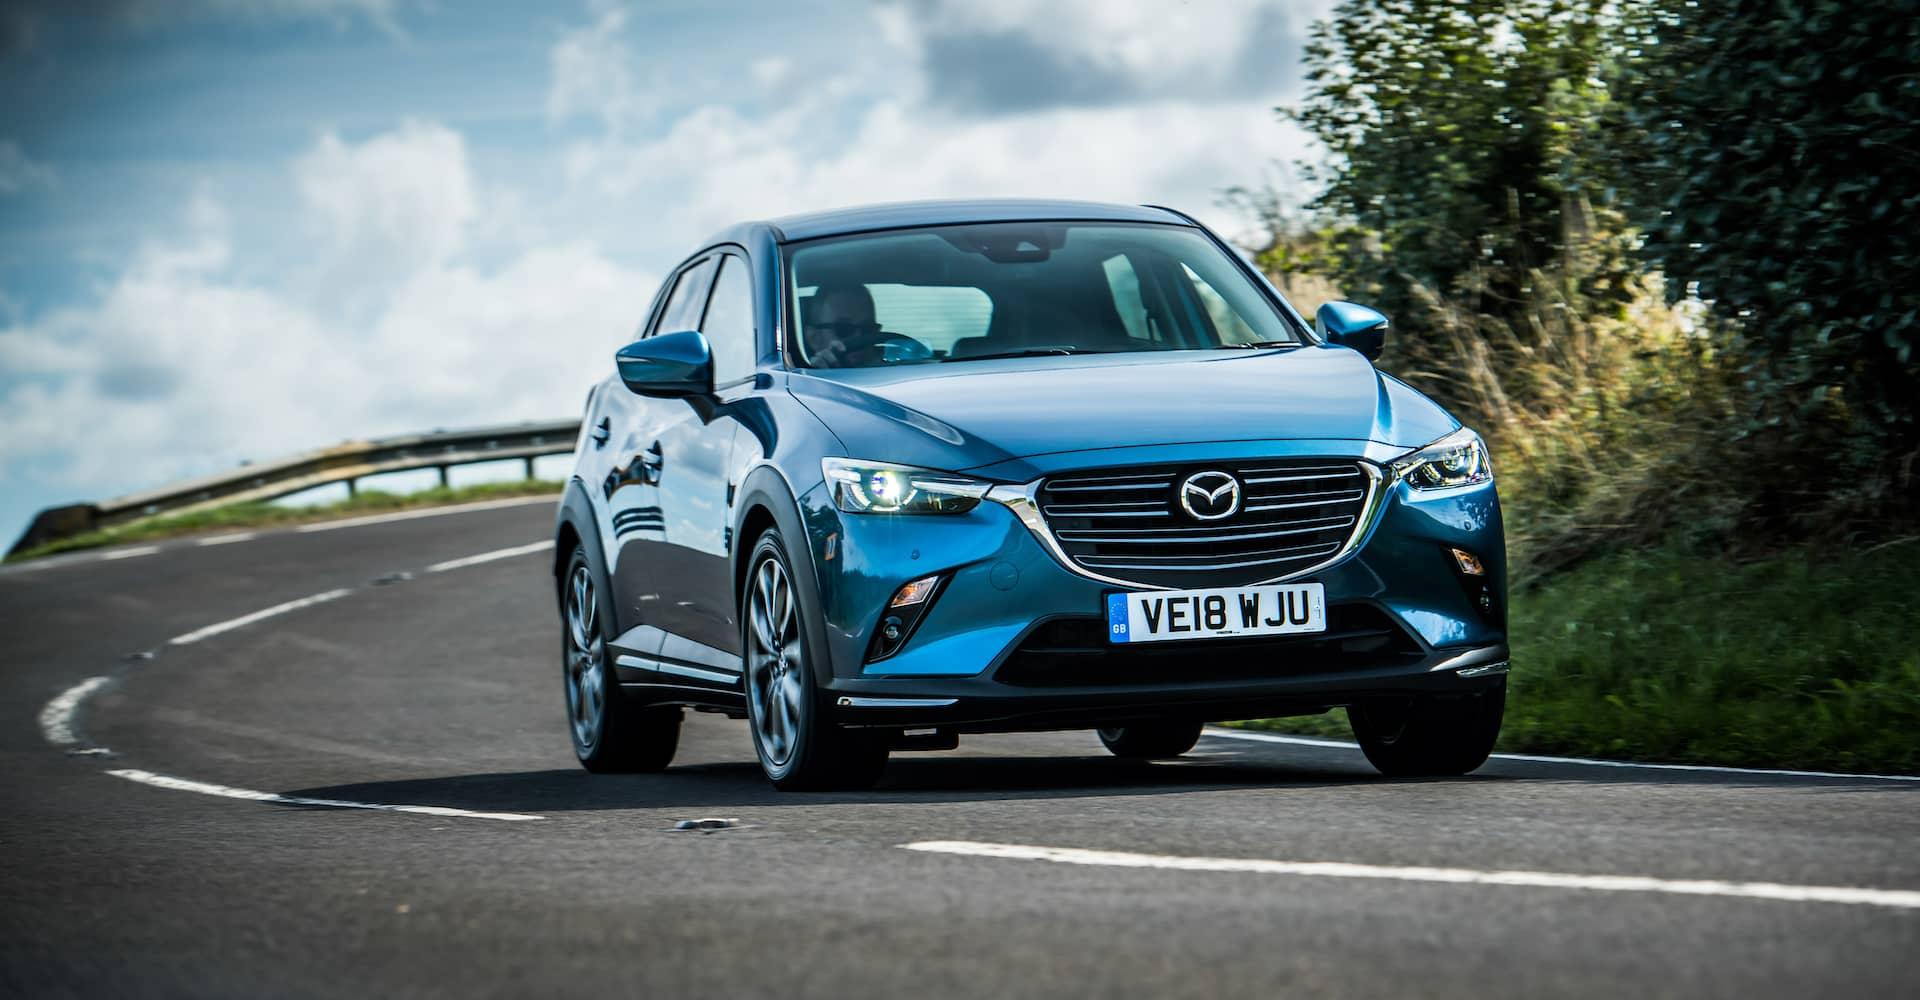 Mazda CX-3 new car ratings and reviews | The Car Expert